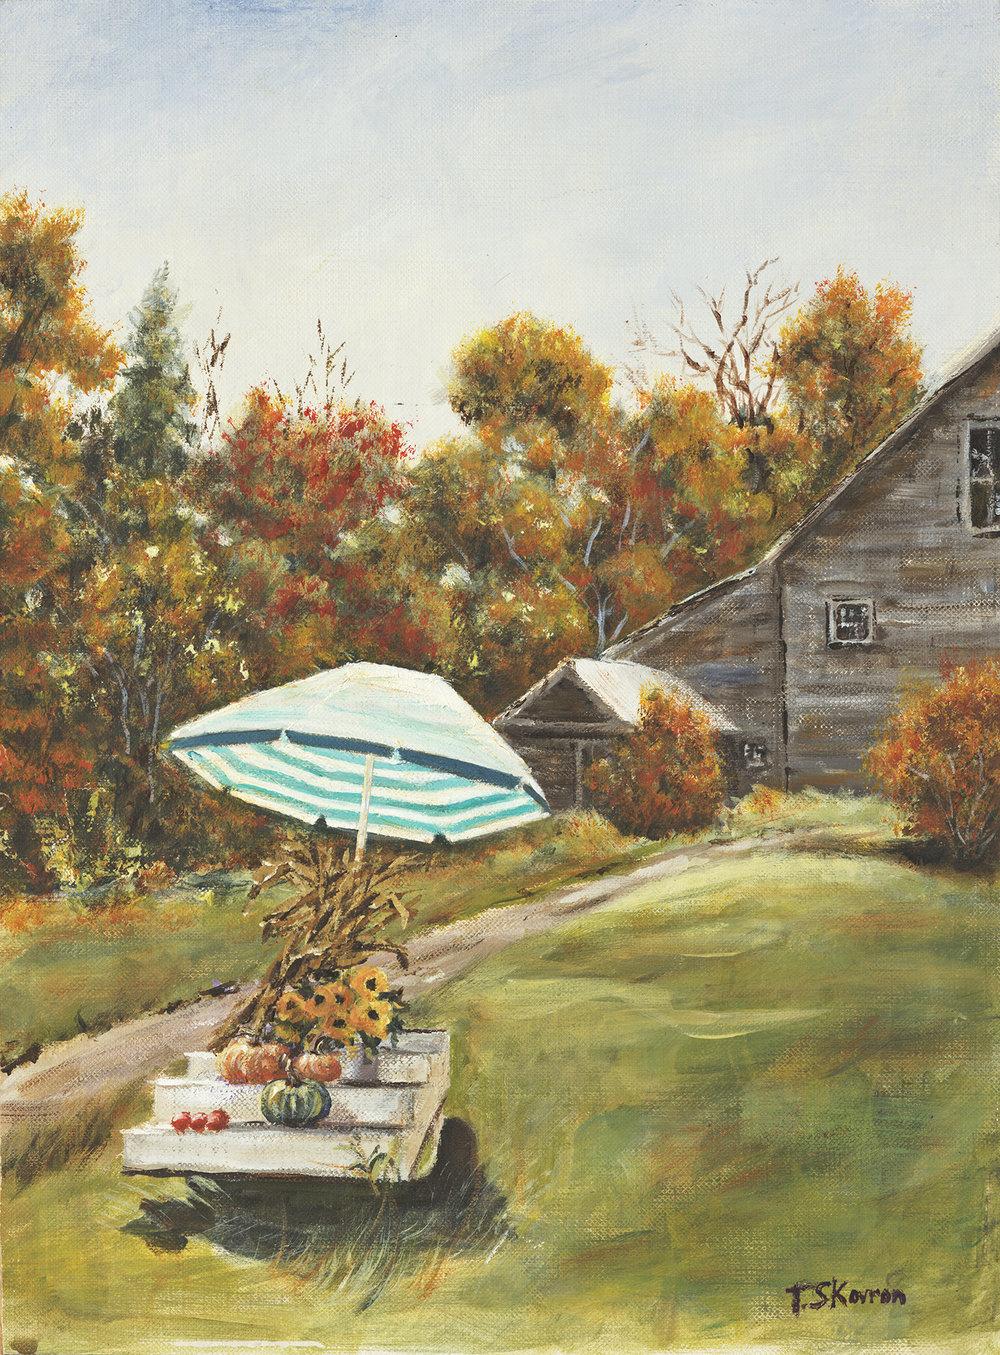 "Roadside Farm Stand - Kensington, NH, 9"" x 12""  Acrylic on canvas panel in 3.5""W black frame"